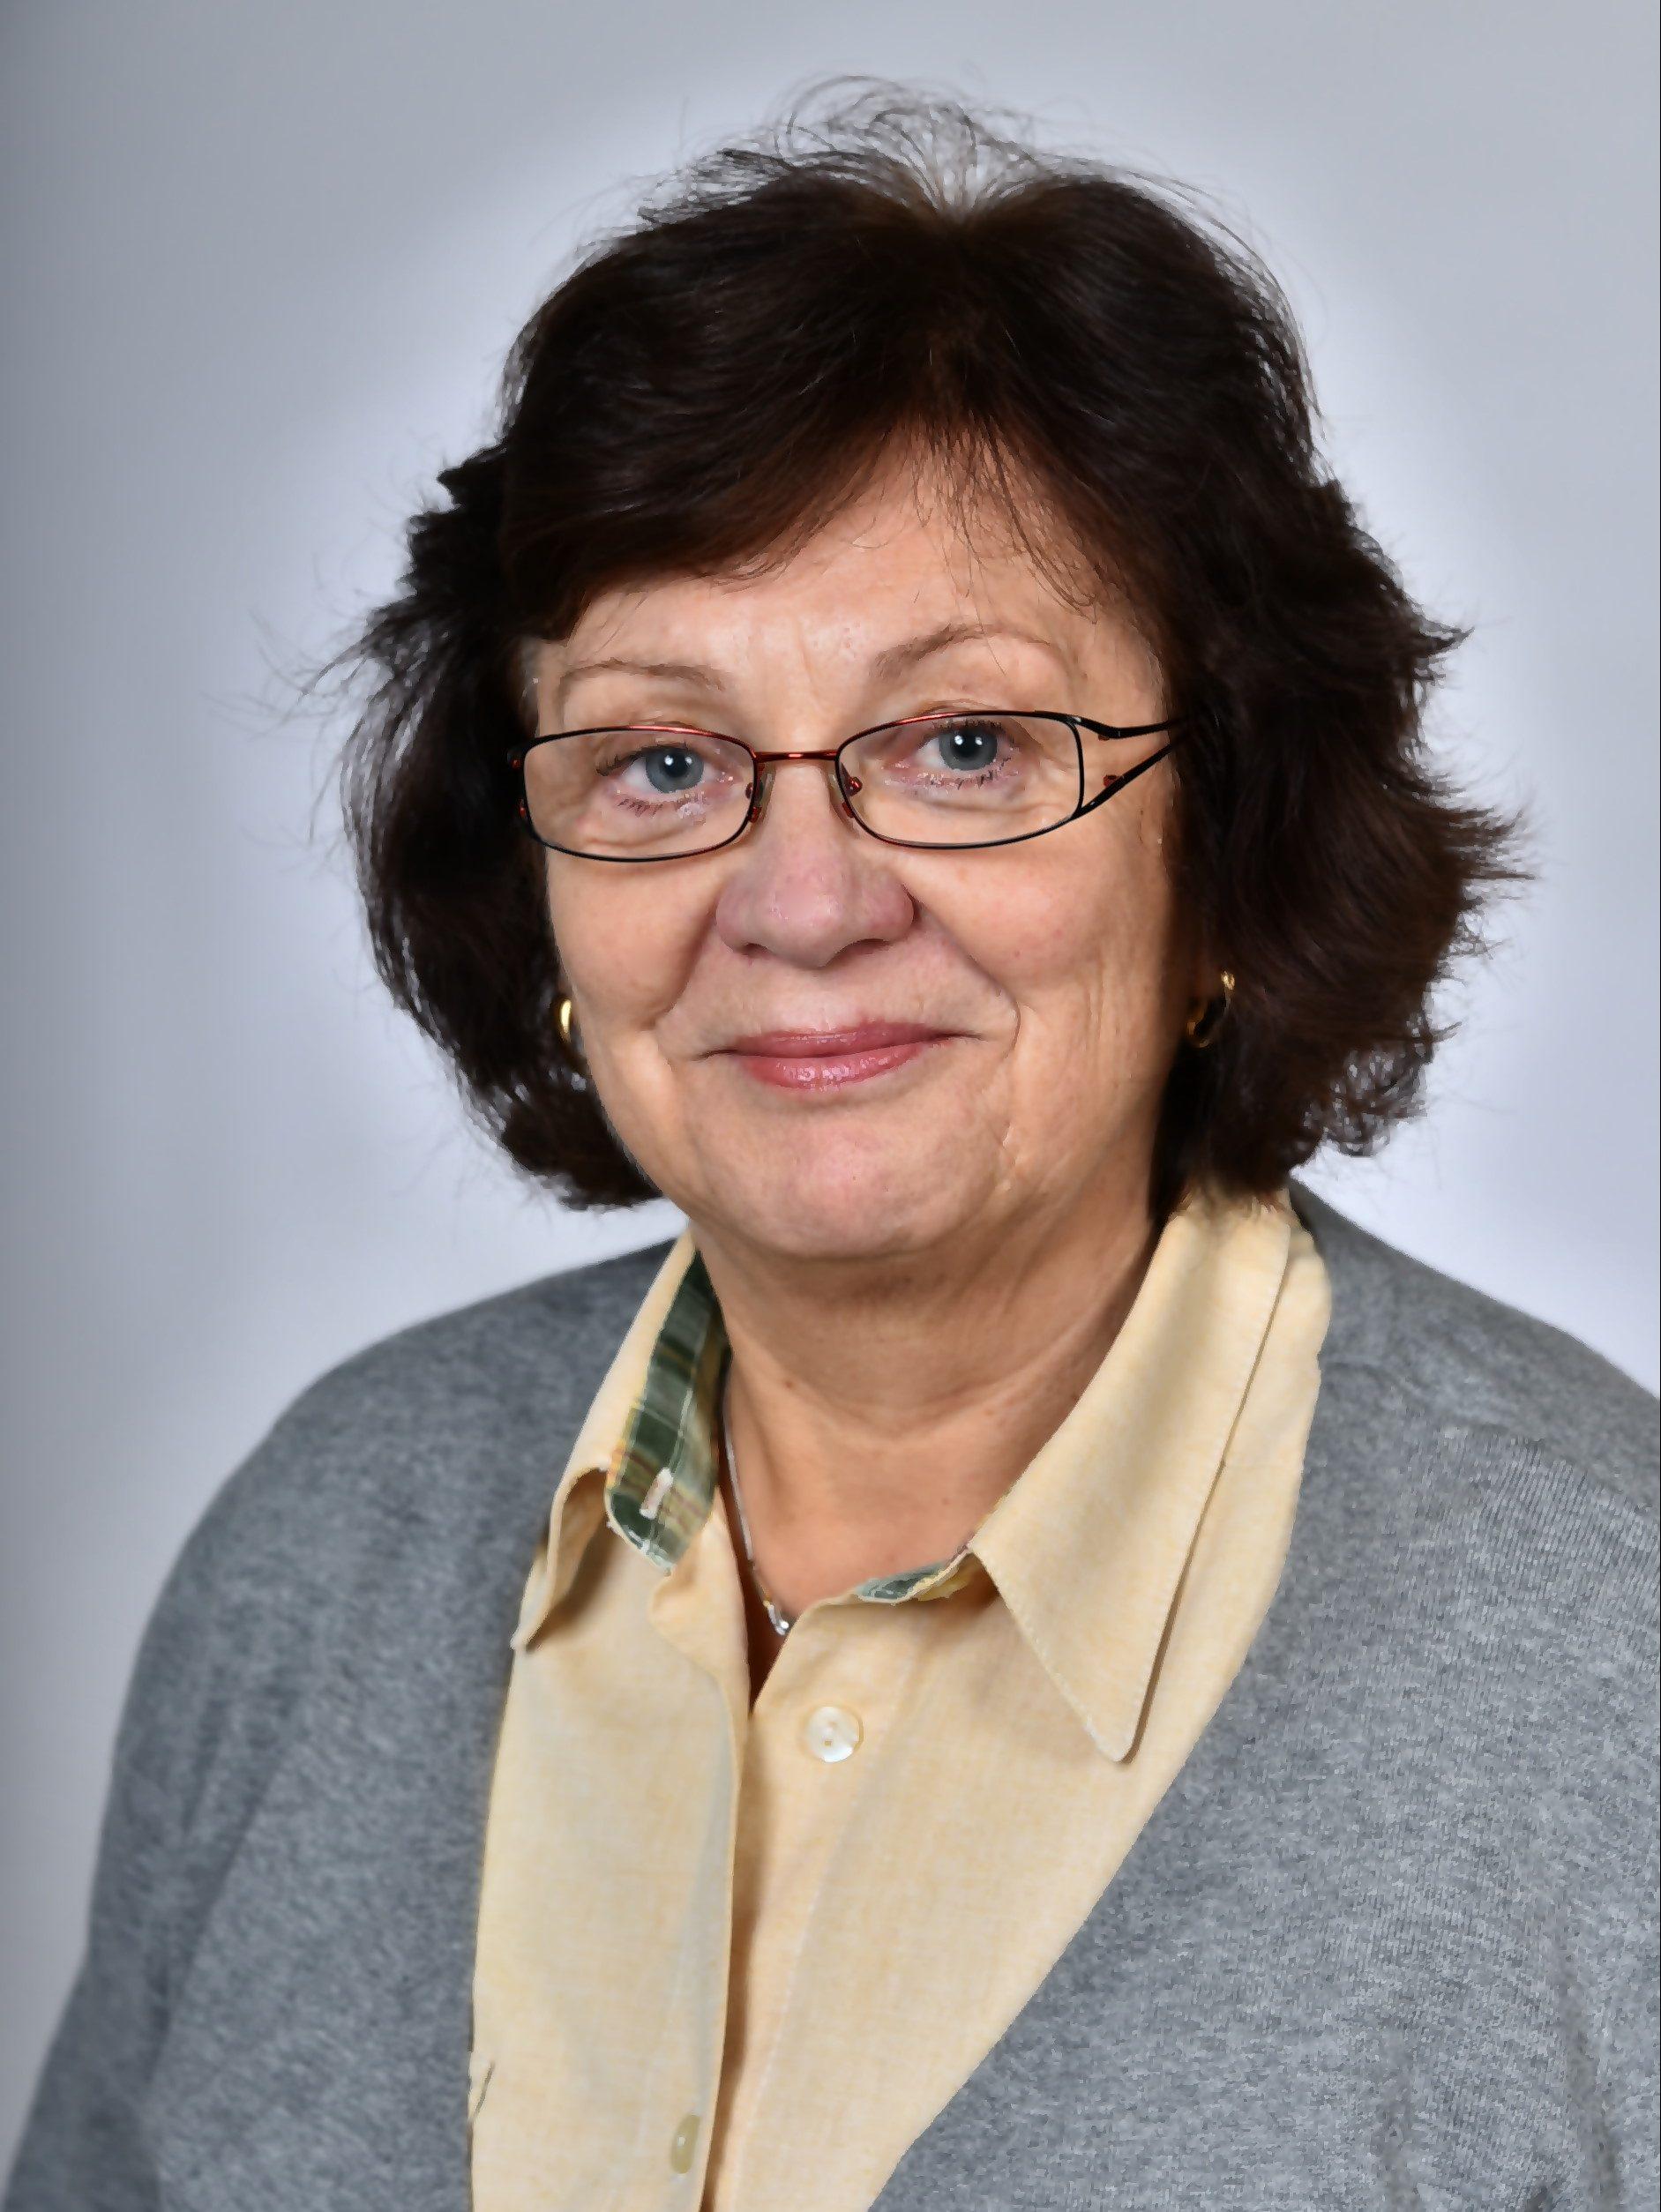 Monika Kulisch